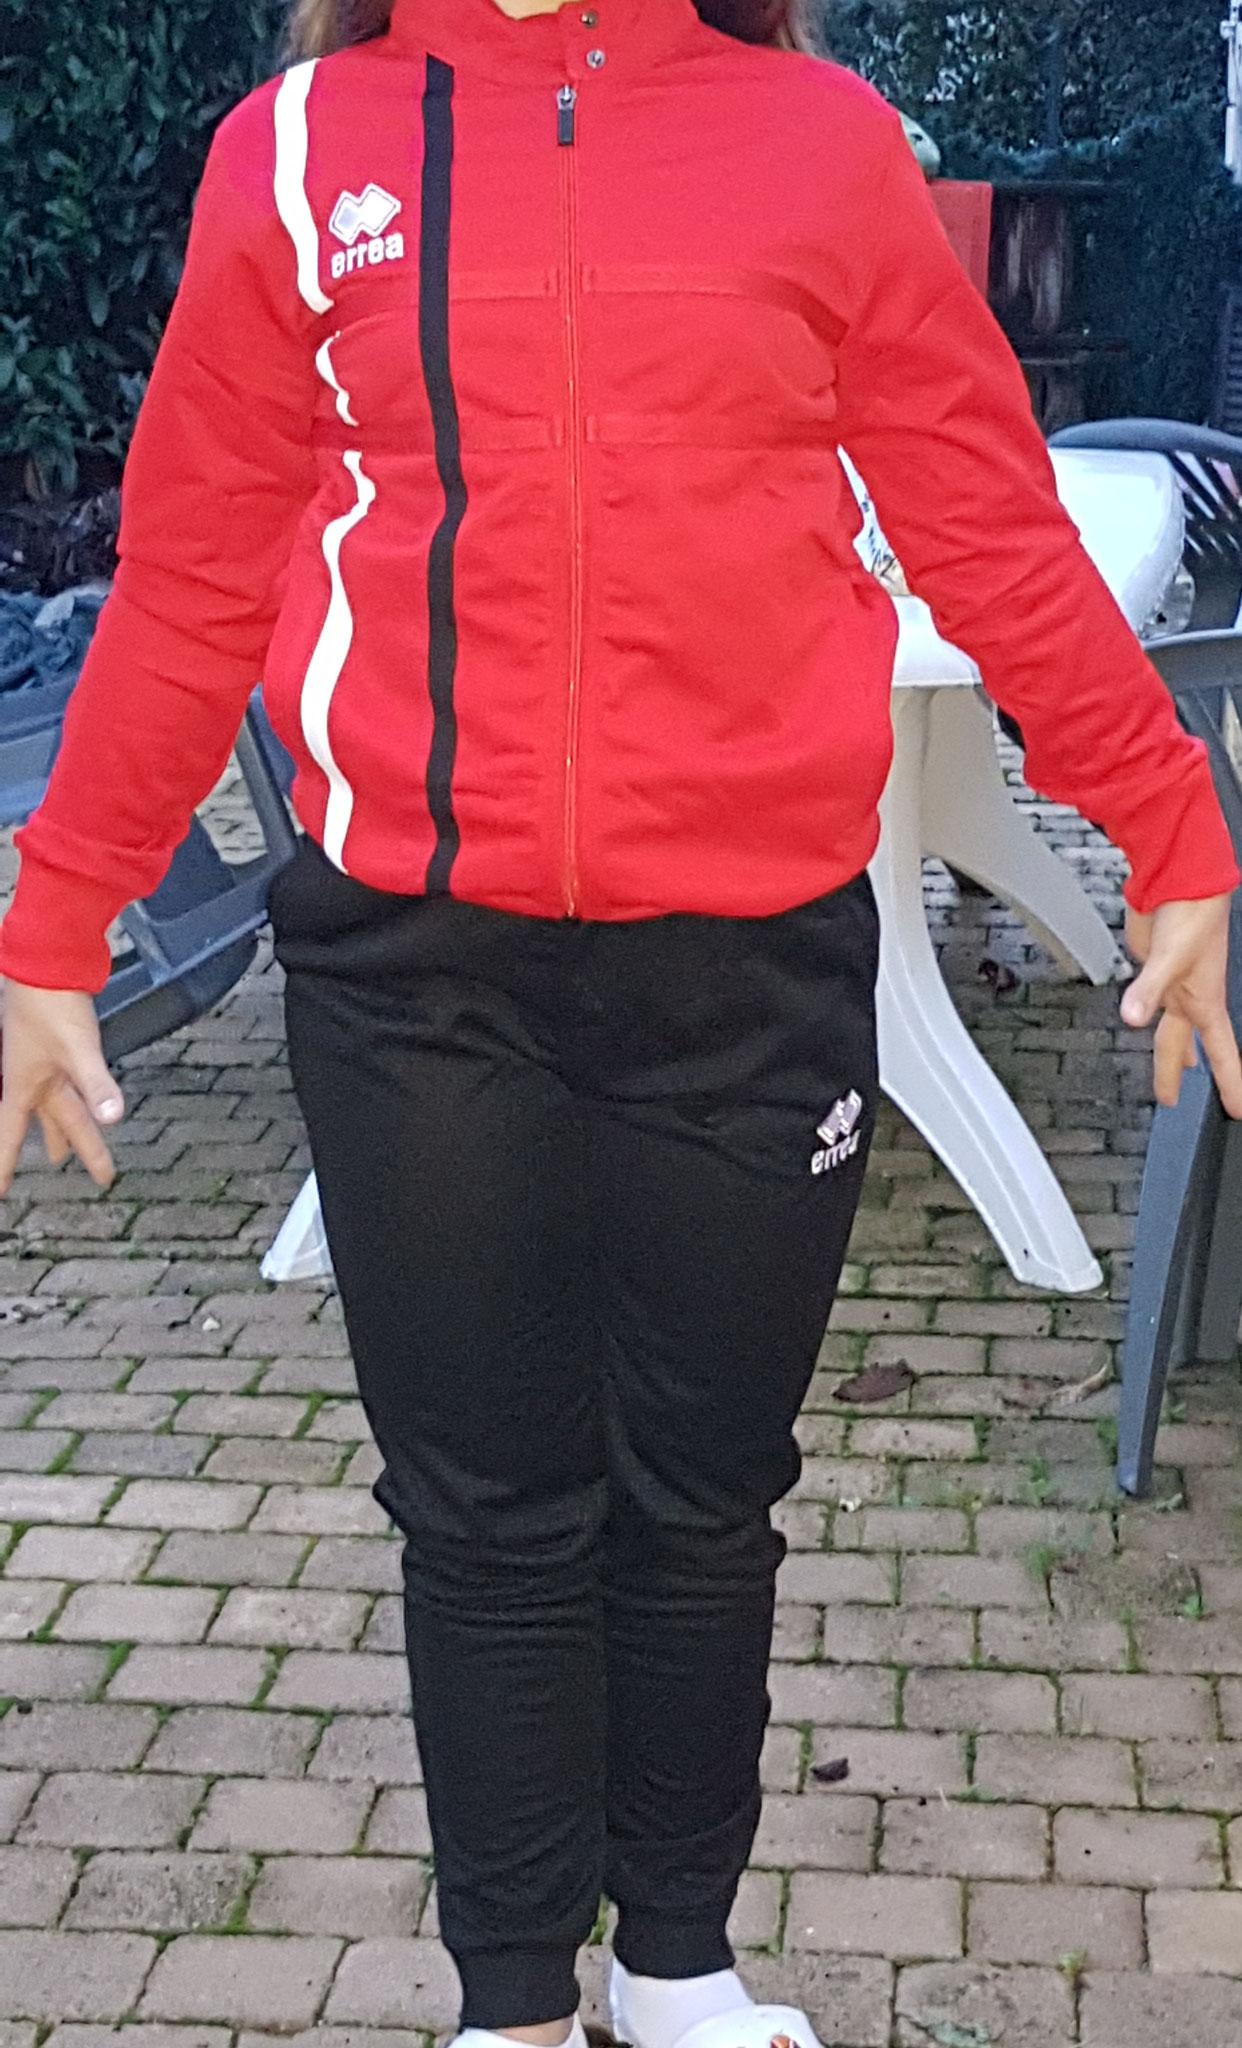 Pantalon - 18€ - Taille 2YXS à L